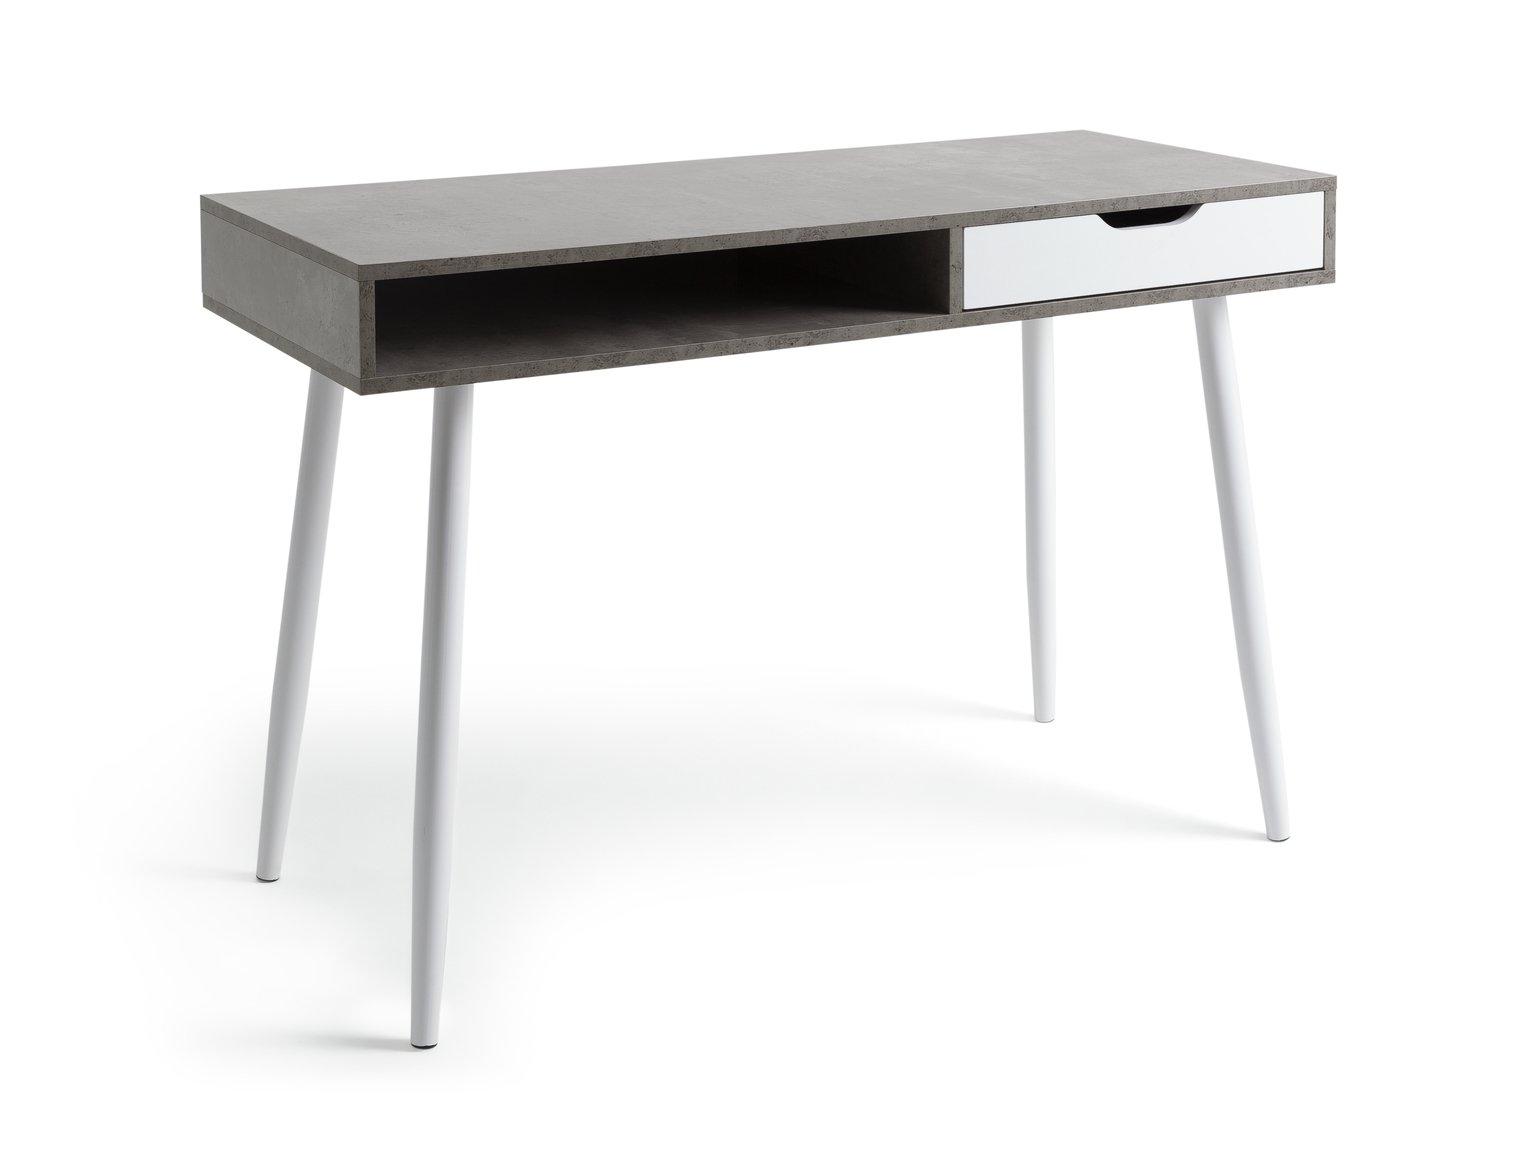 Argos Home Concrete Style Office Desk